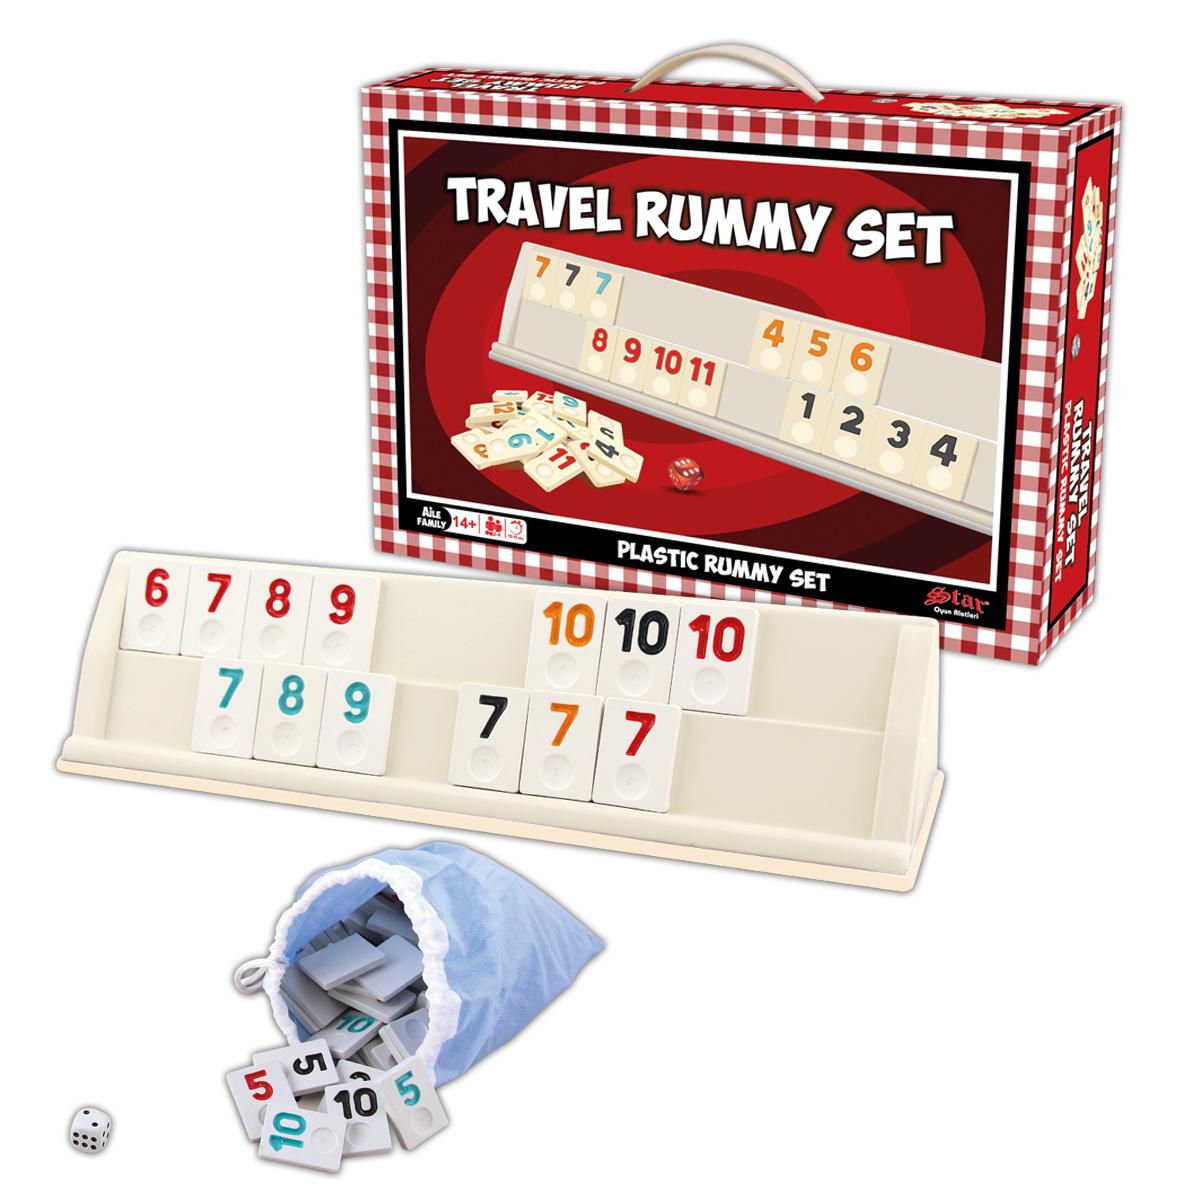 Travel Rummy Set